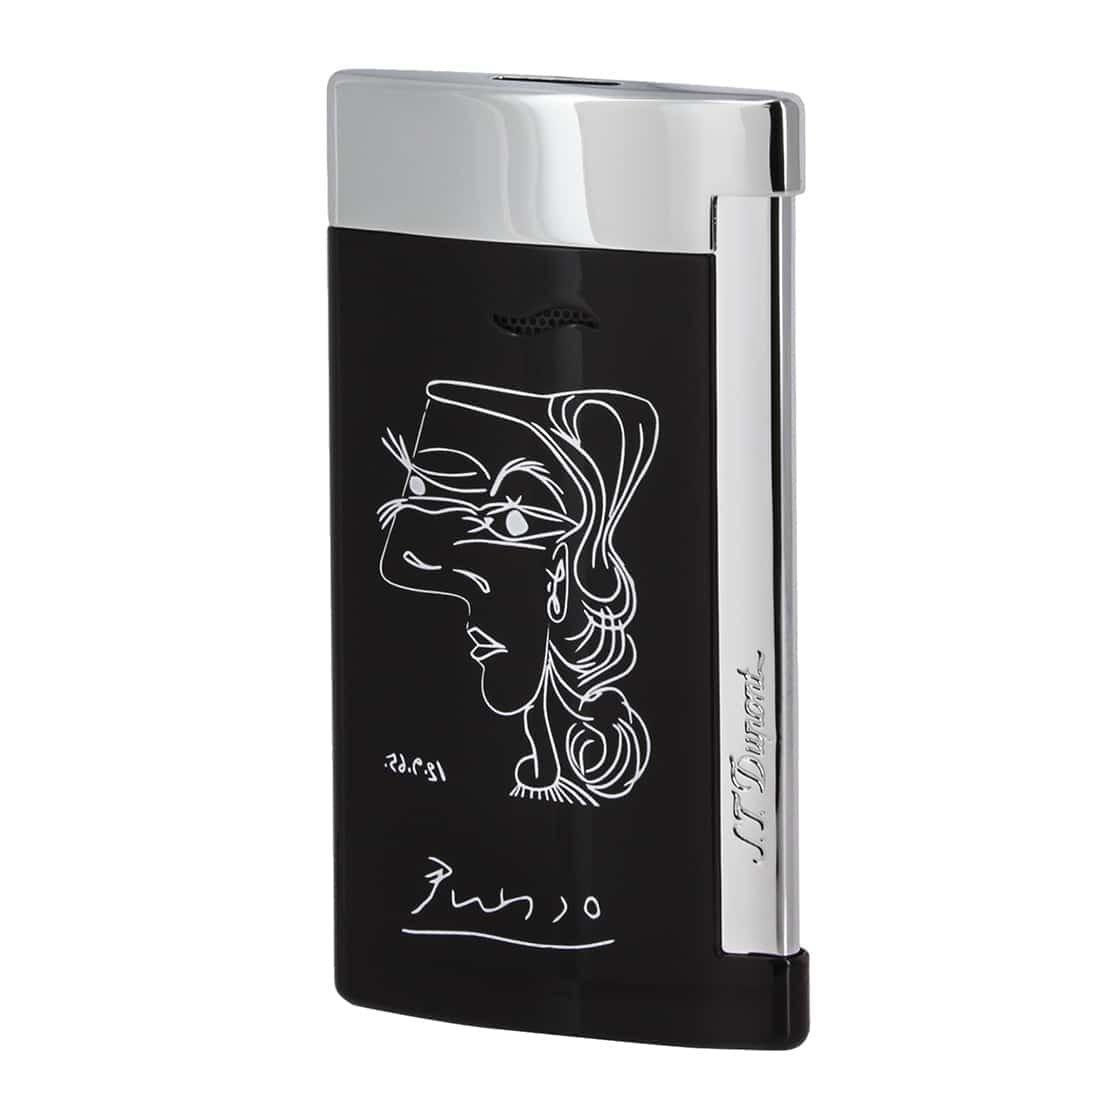 deluxe black picasso slim 7 lighter - S.T. Dupont